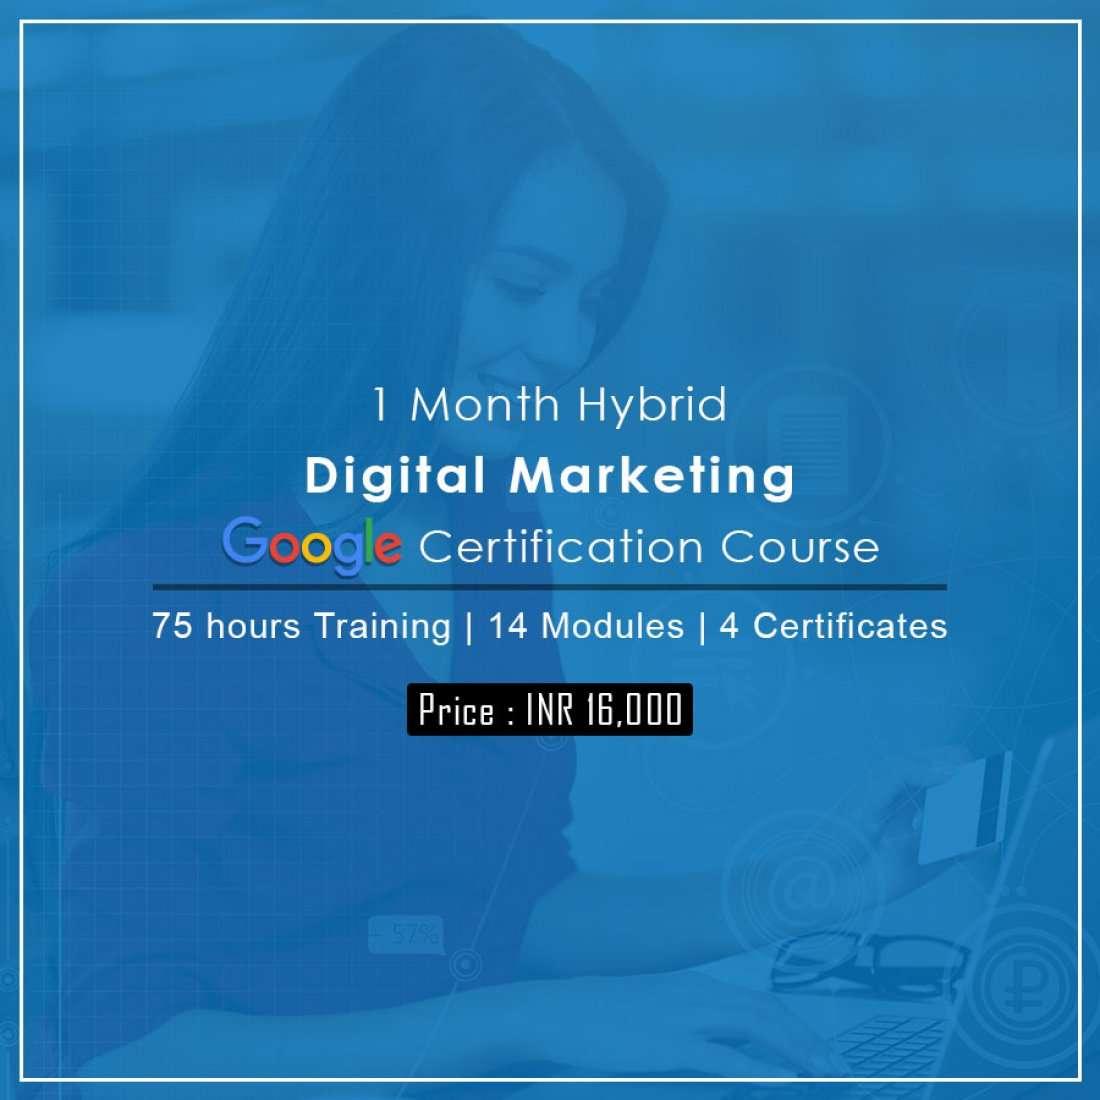 1 Month Digital Marketing - Google Certification Program